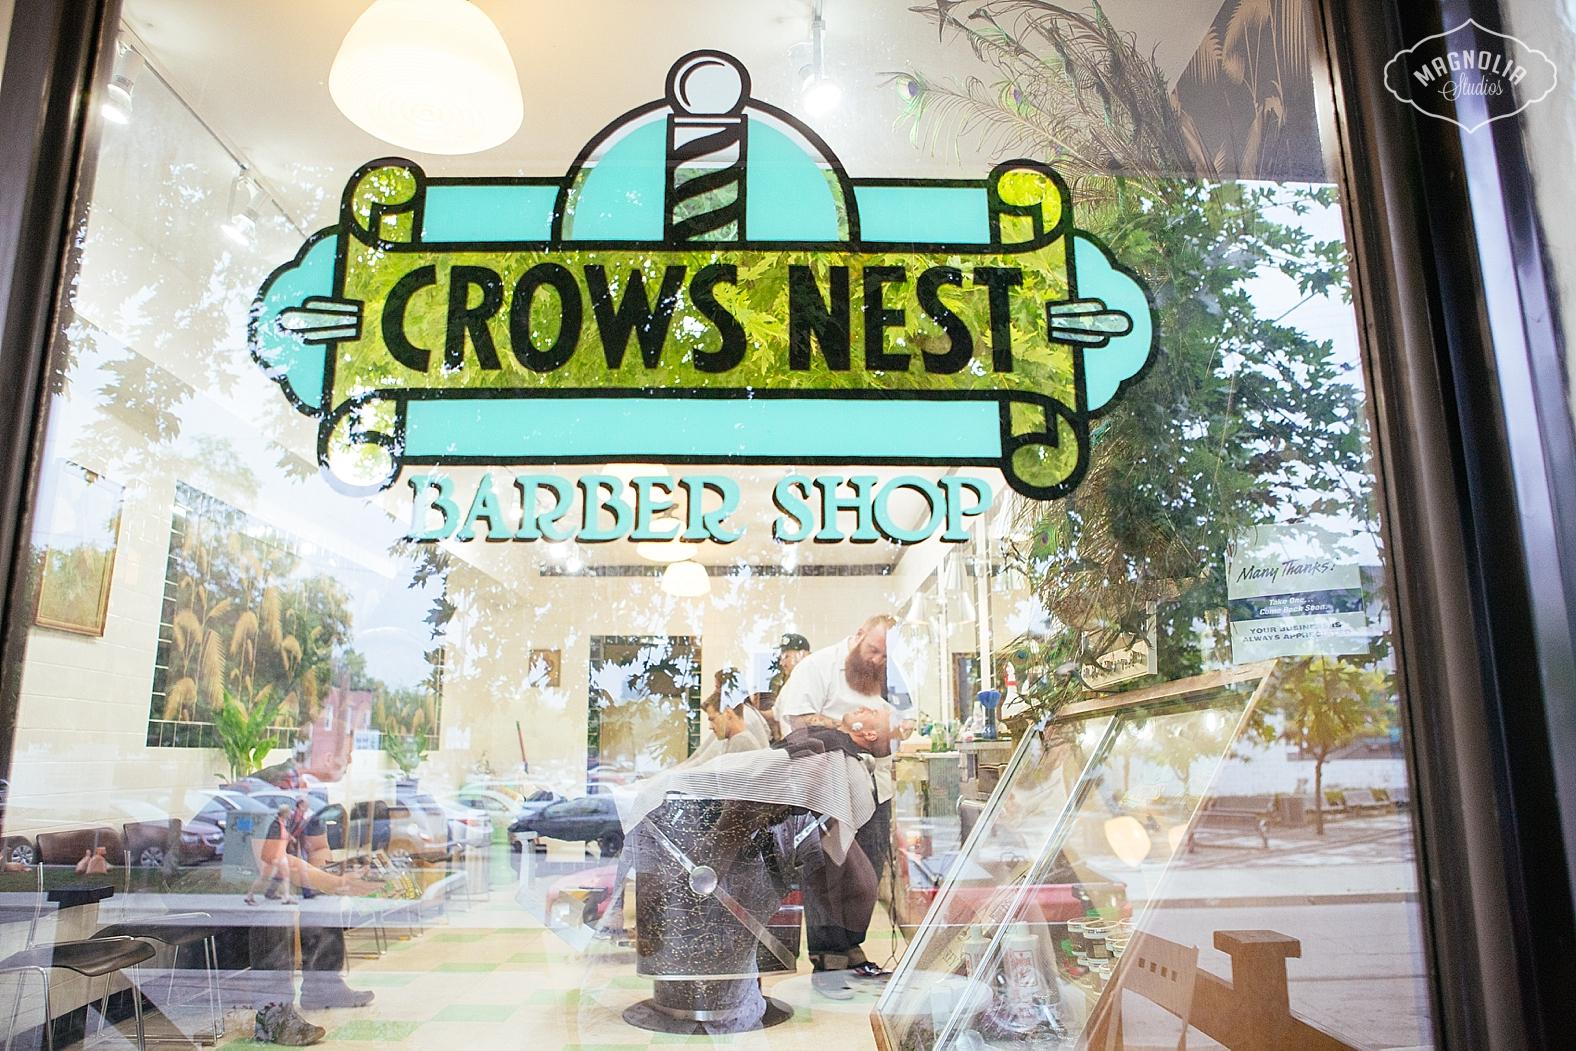 Crowsnest Barbershop